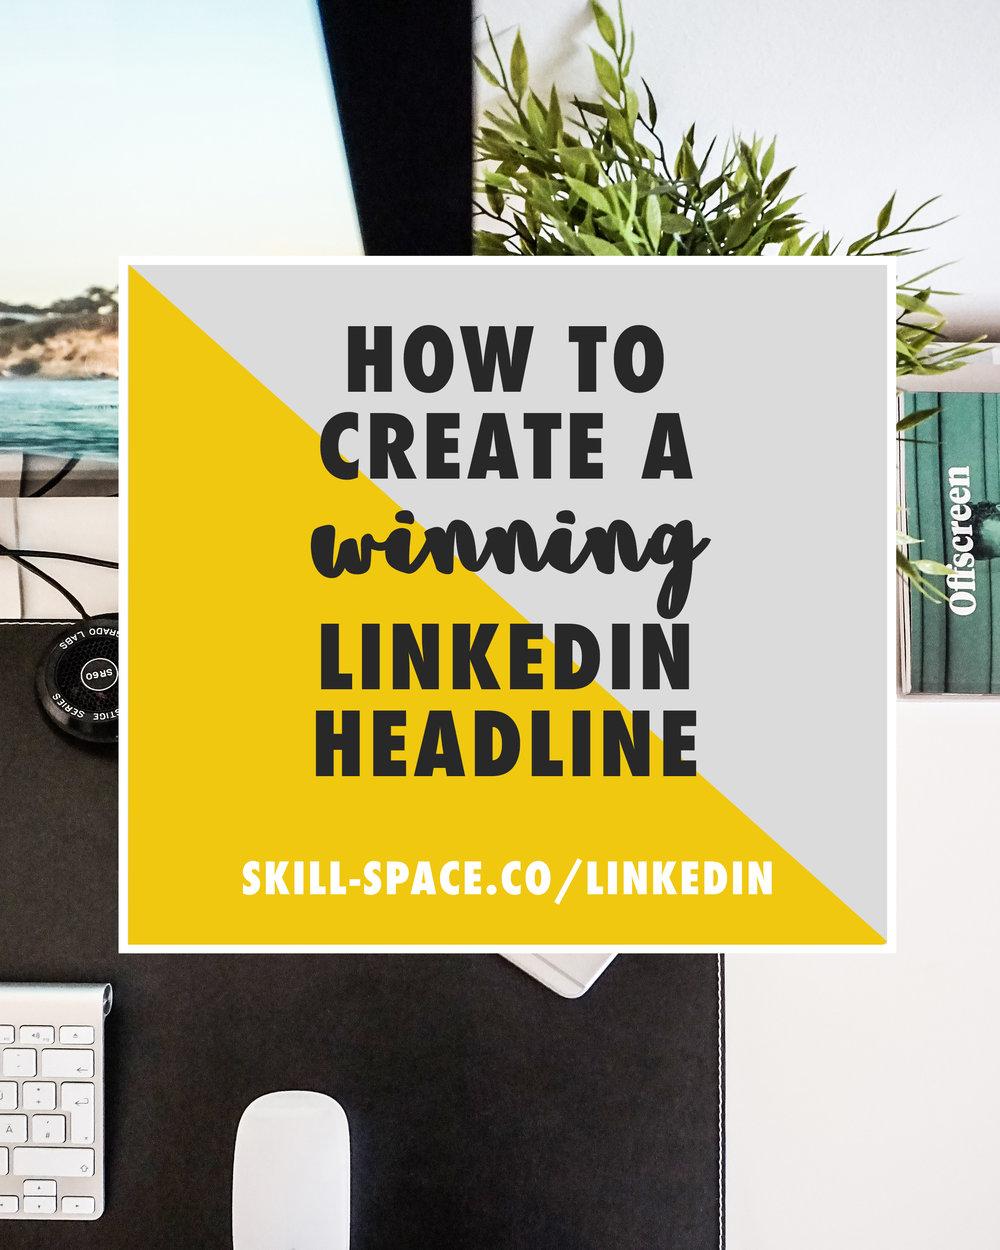 How to create a winning linkedin headline